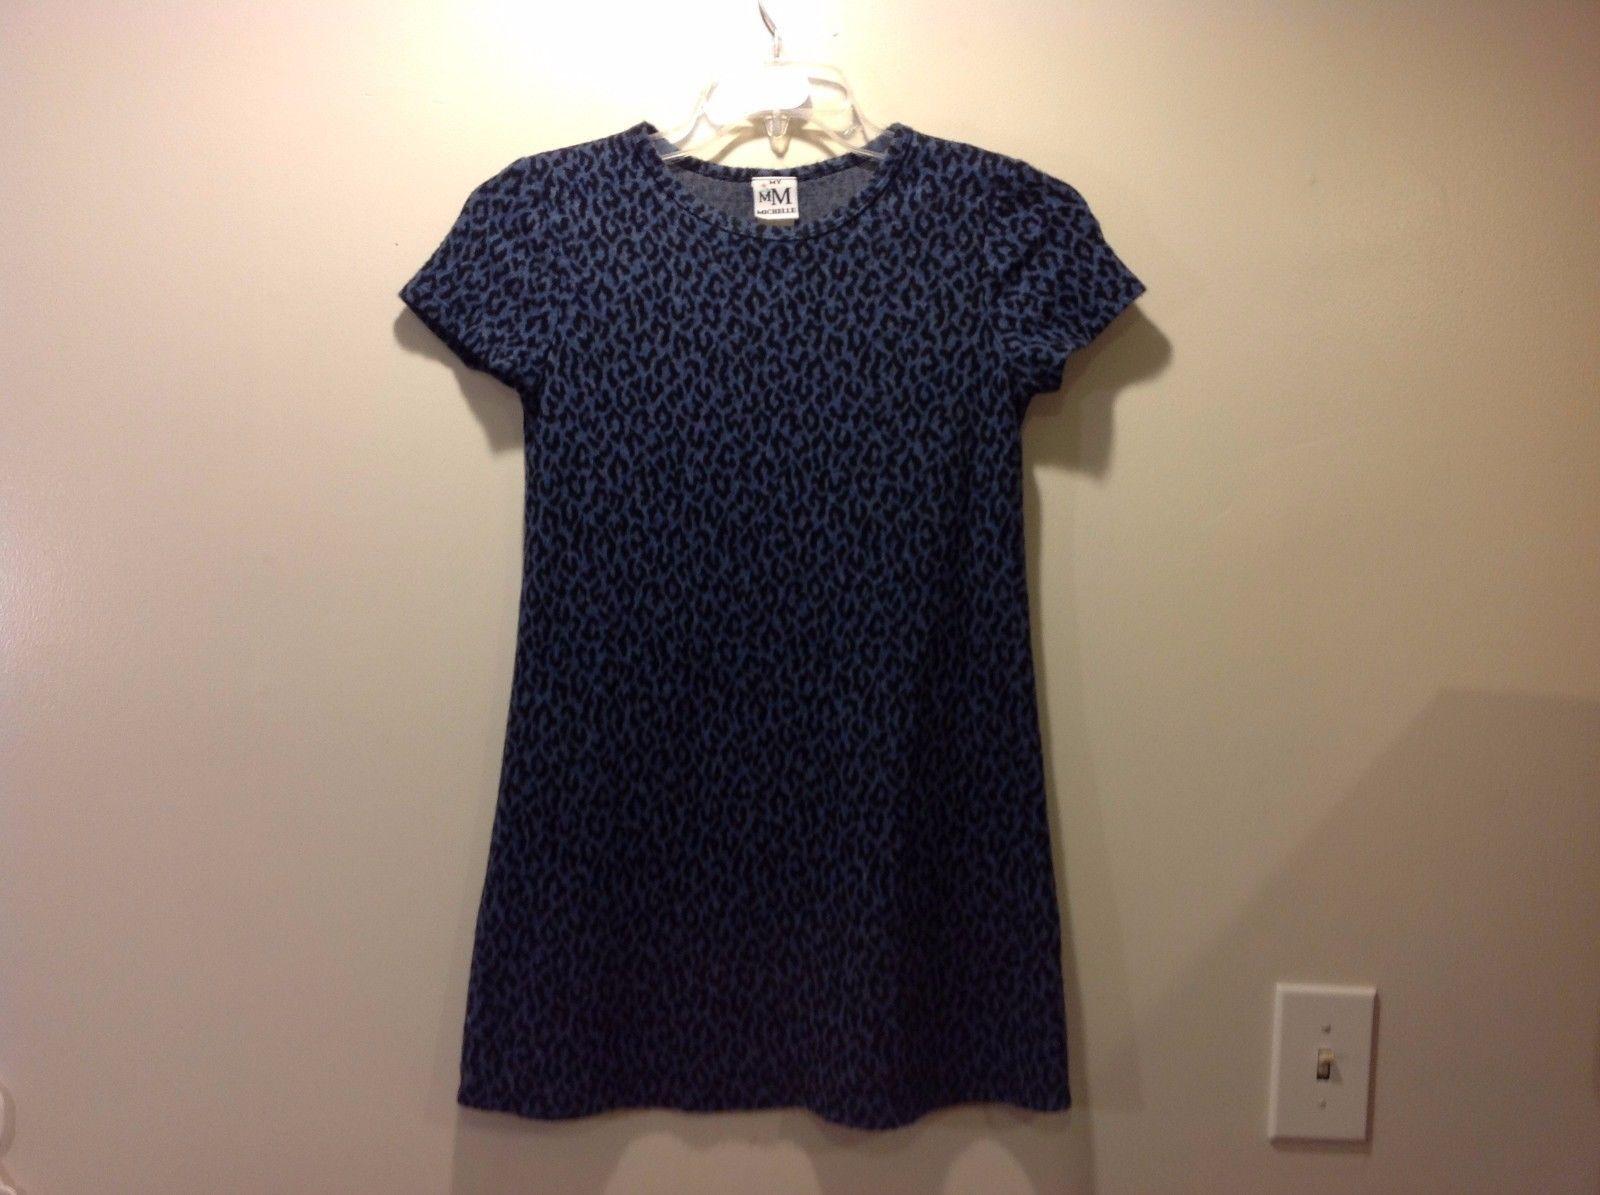 Great Condition Soft Blue Gray Black Leopard Print 16 Dress Blouse My Michelle